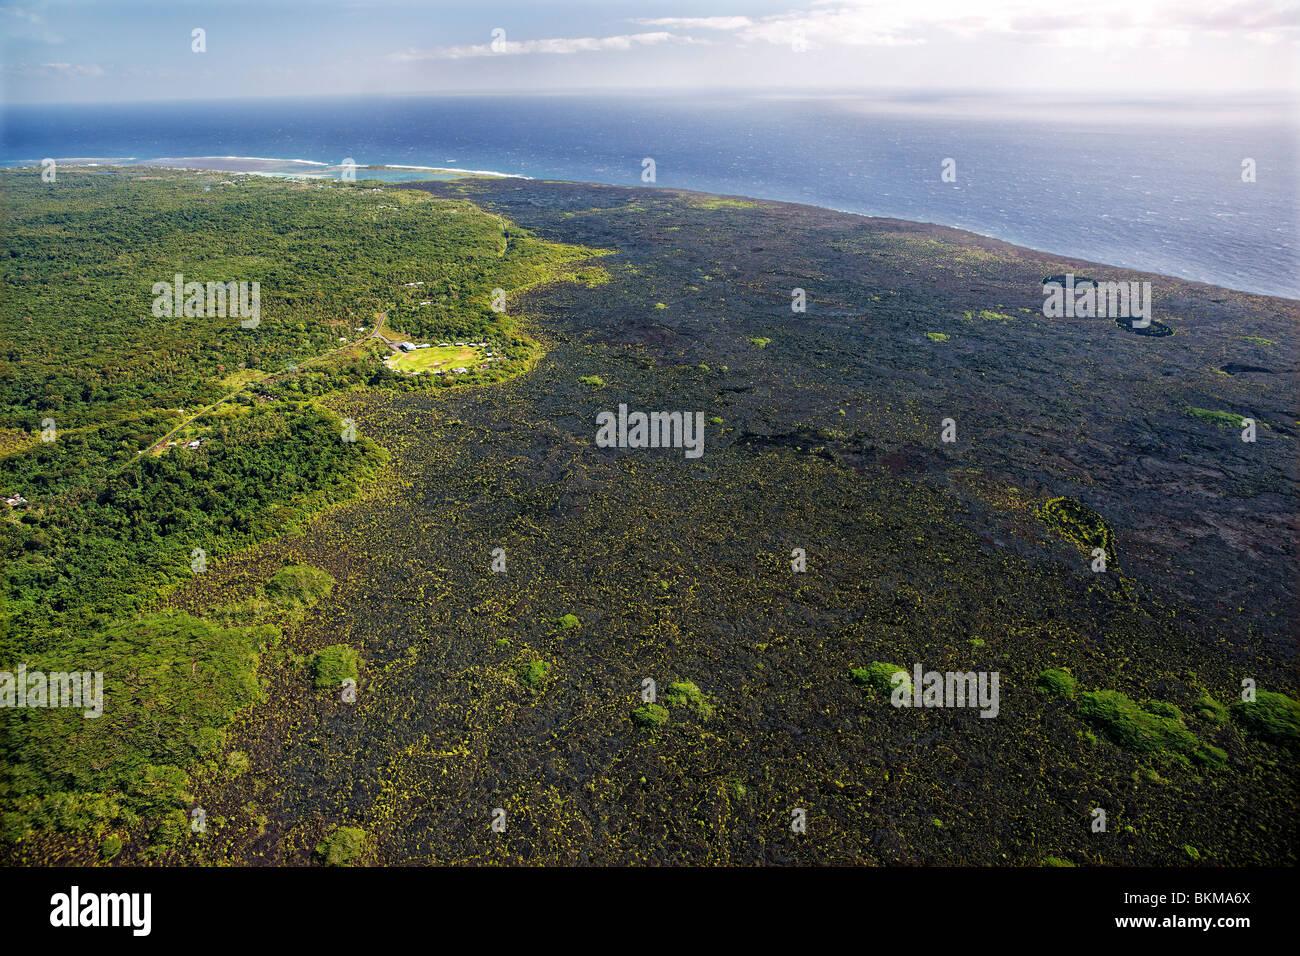 Aerial view of Mauga village and lava flow, Savaii, Samoa - Stock Image